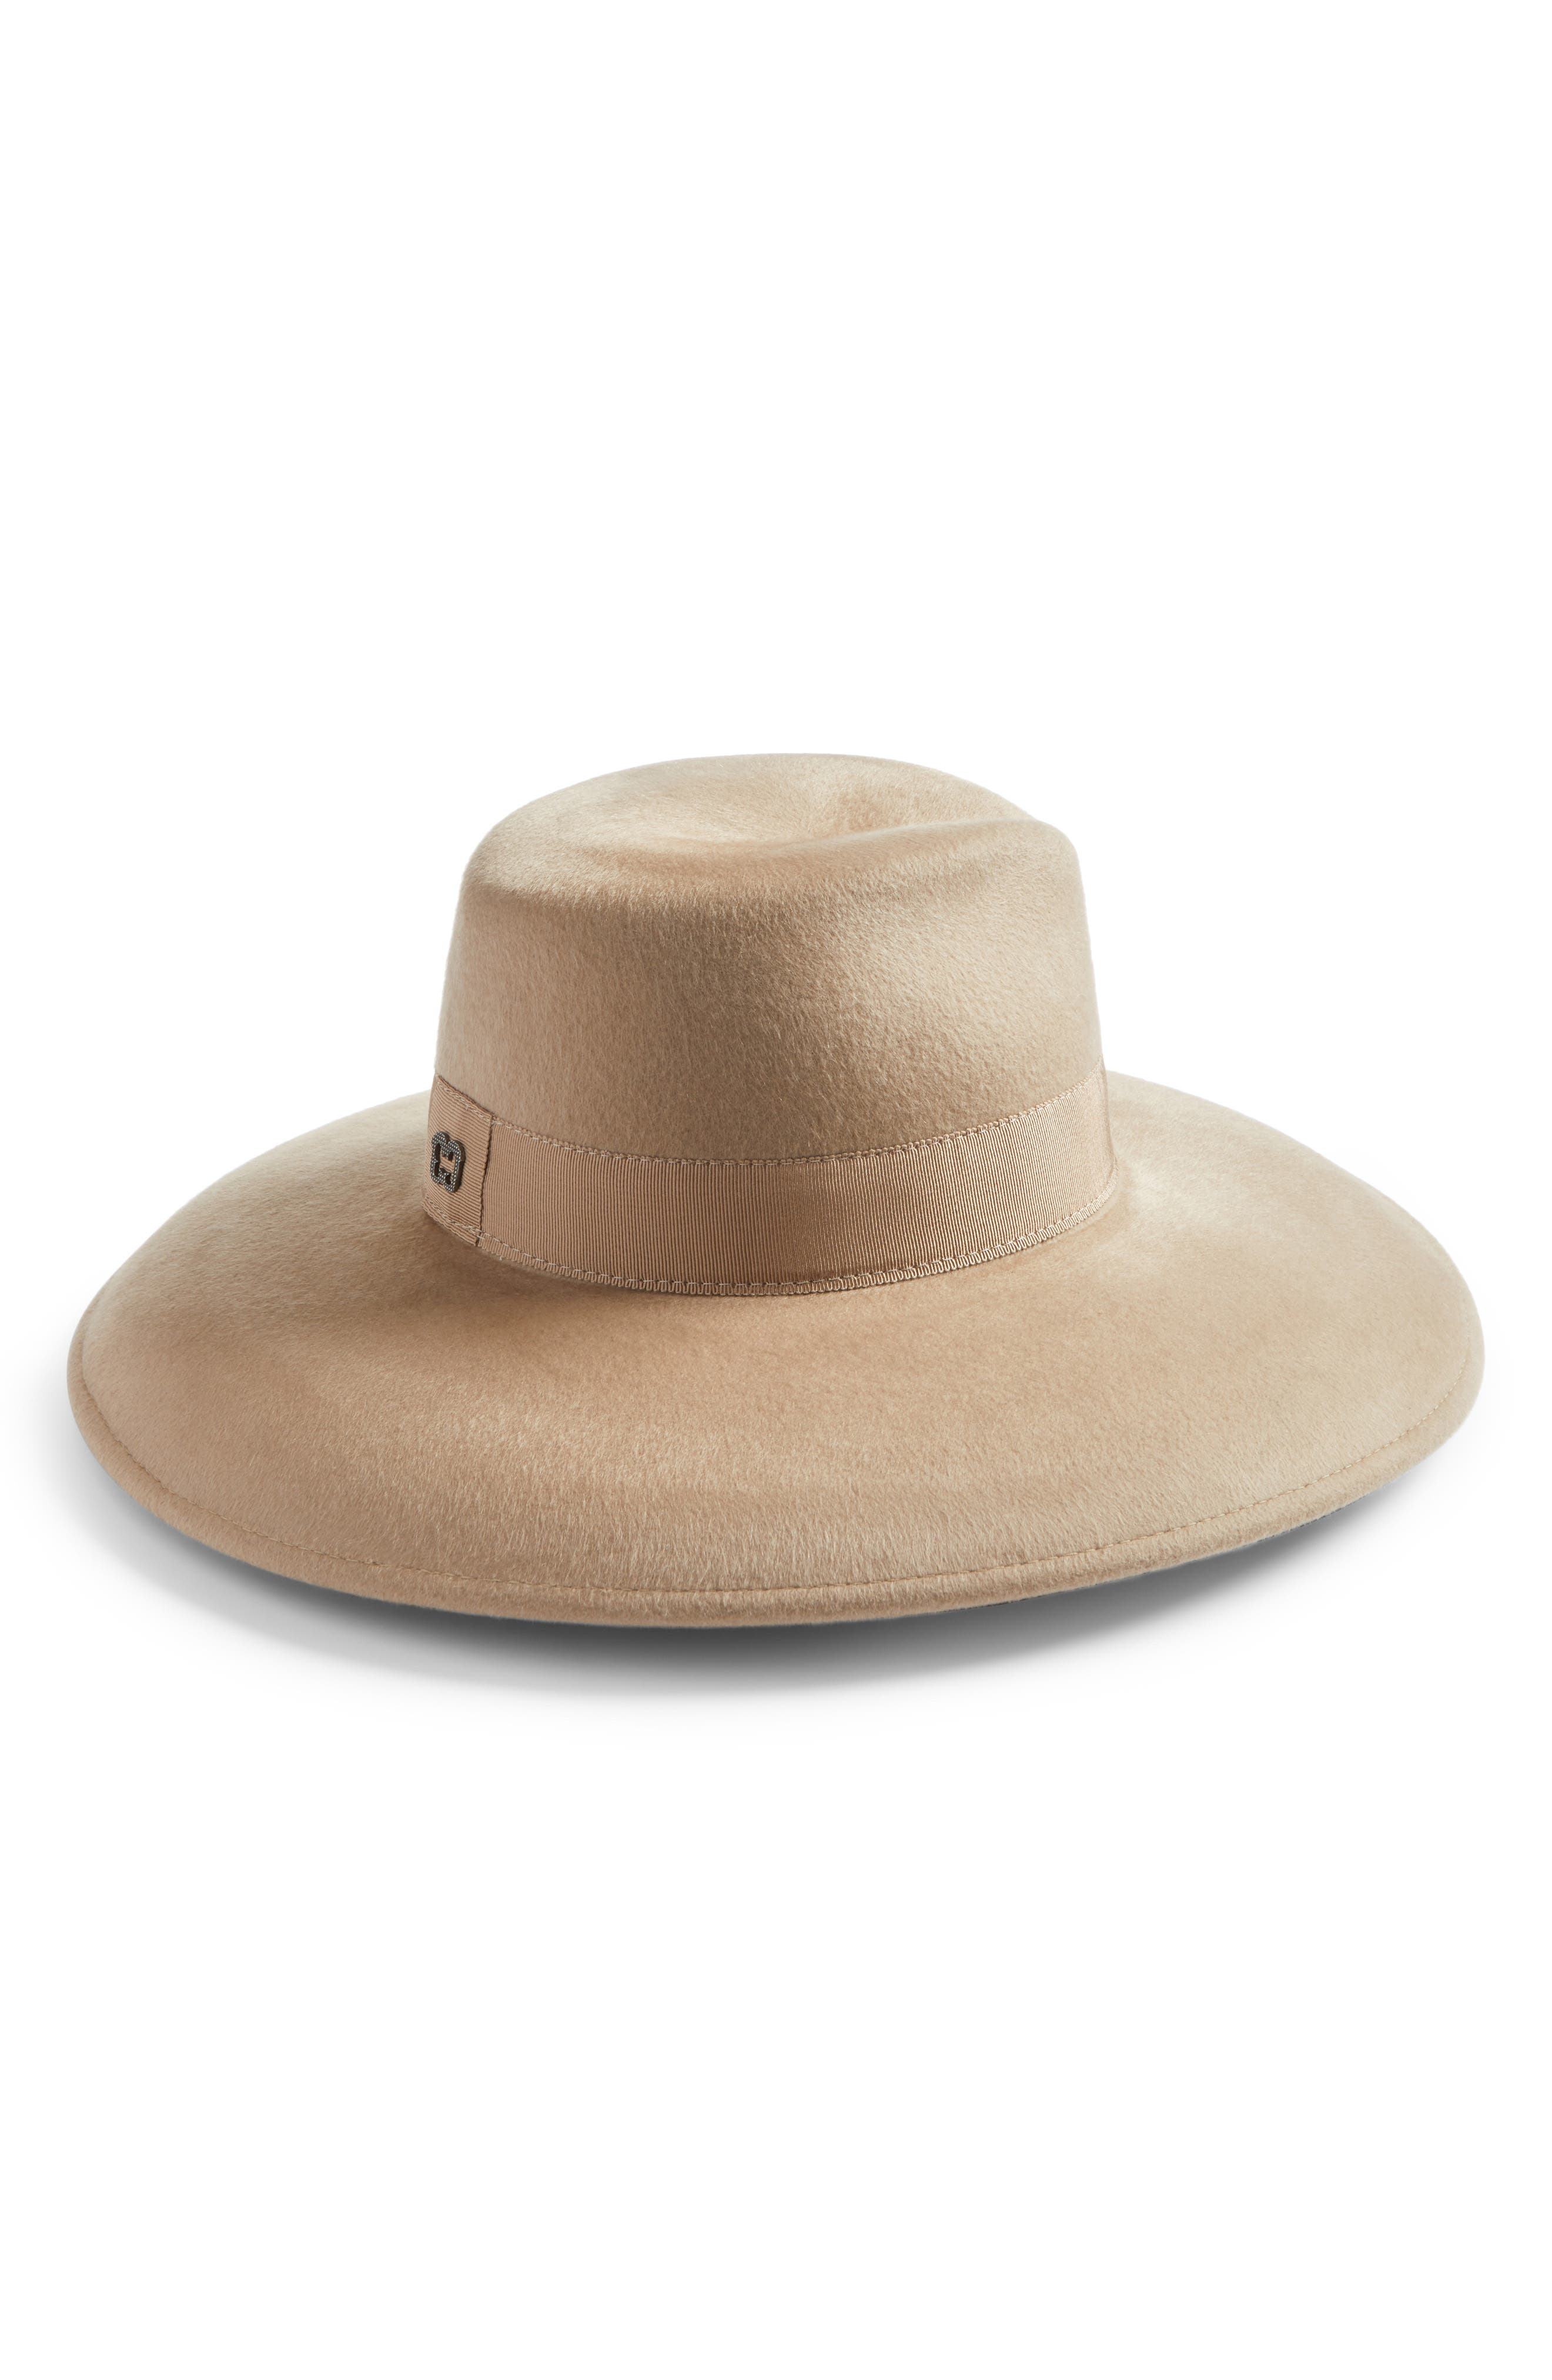 Eric Javits Camille Wool Floppy Hat